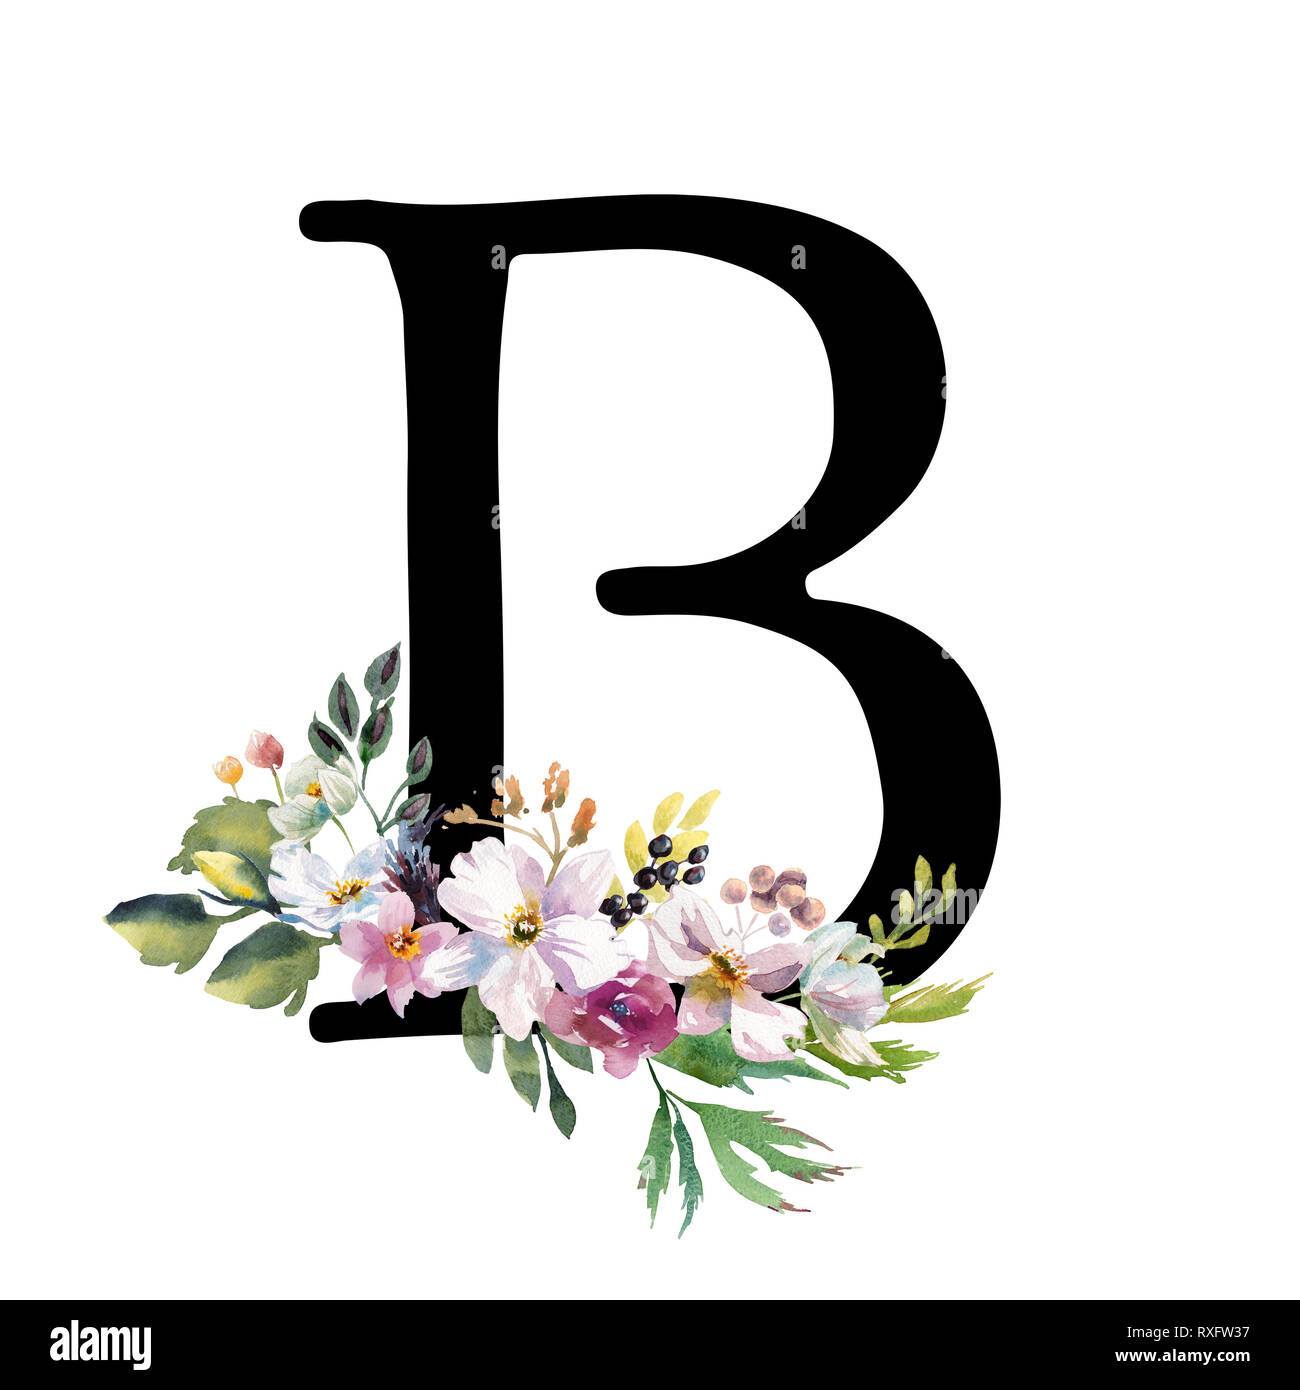 Romántica Letra B Oro Acuarela Dibujada Con Flores Elegante